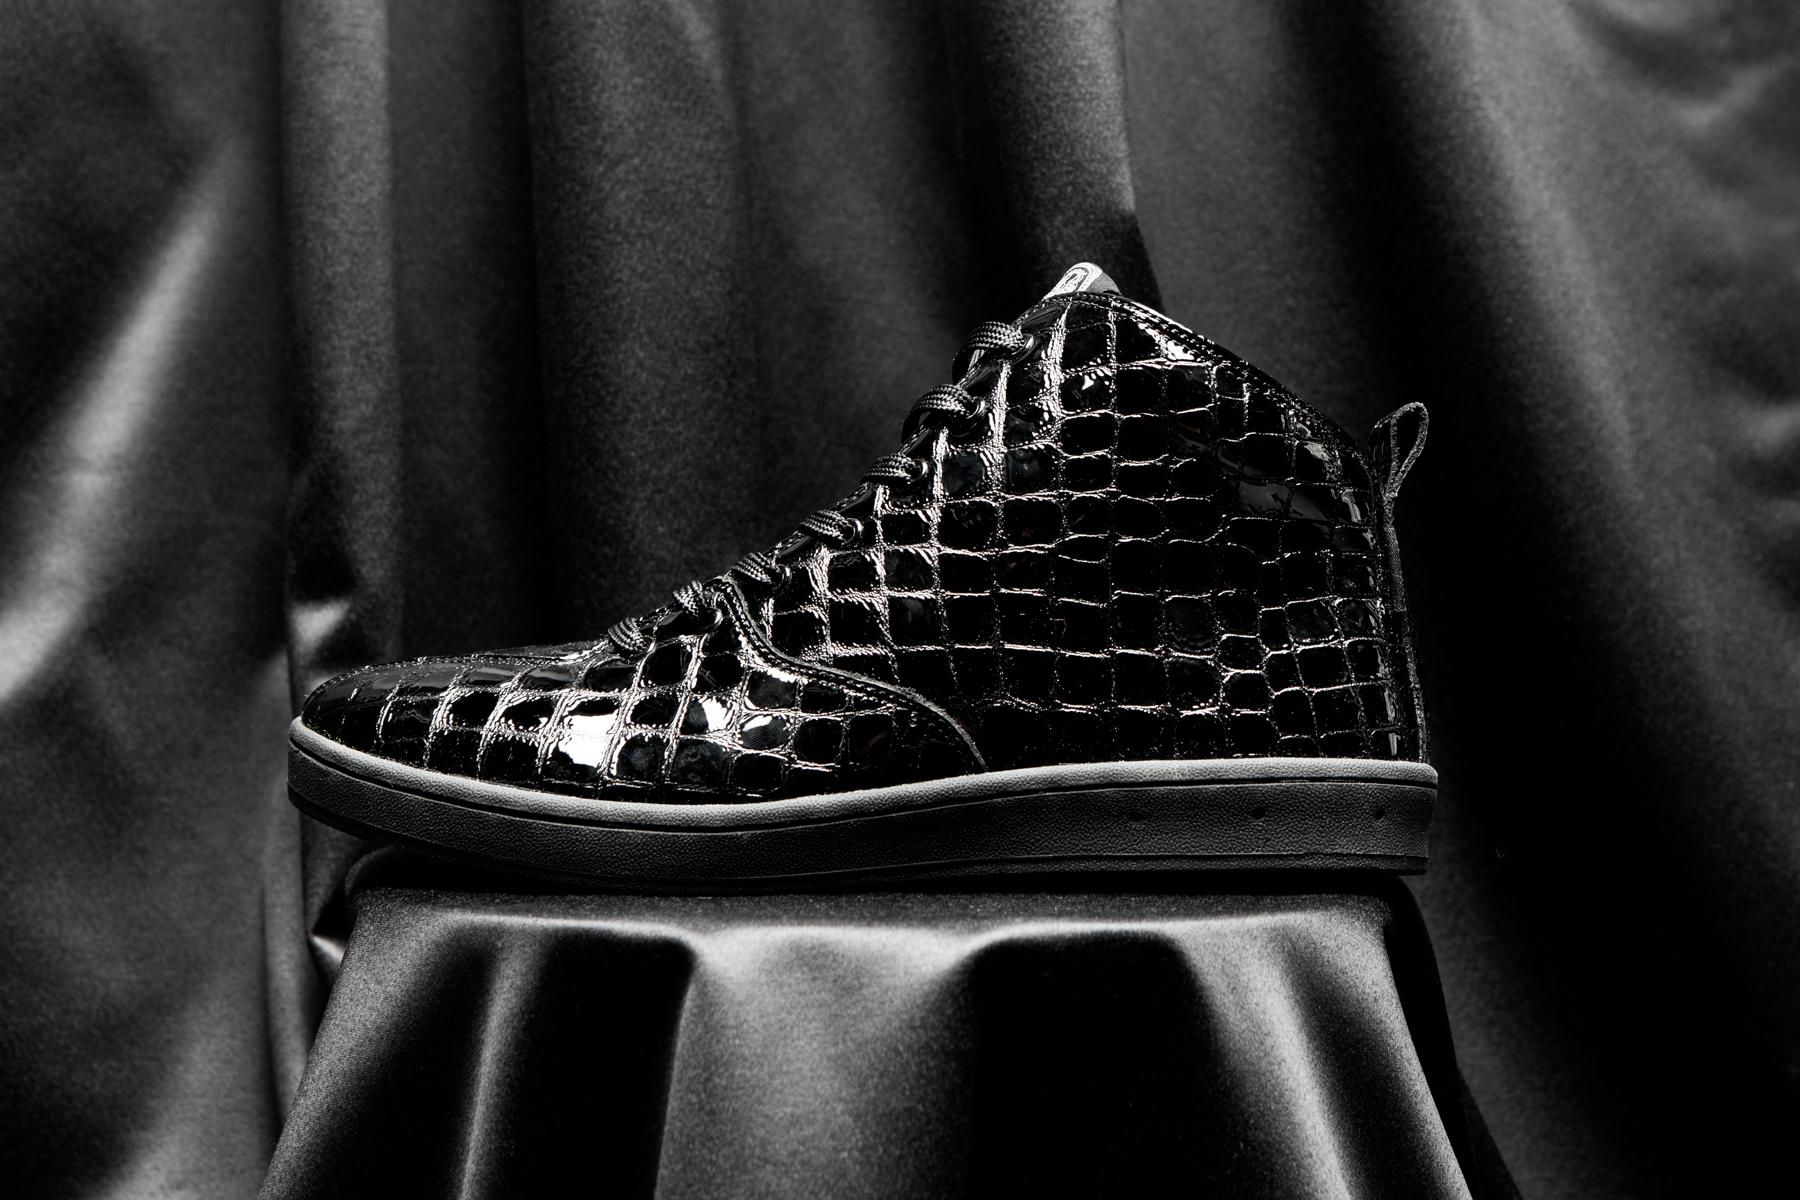 gourmet 2014 fall winter black croc quattro skate 2 sneakers